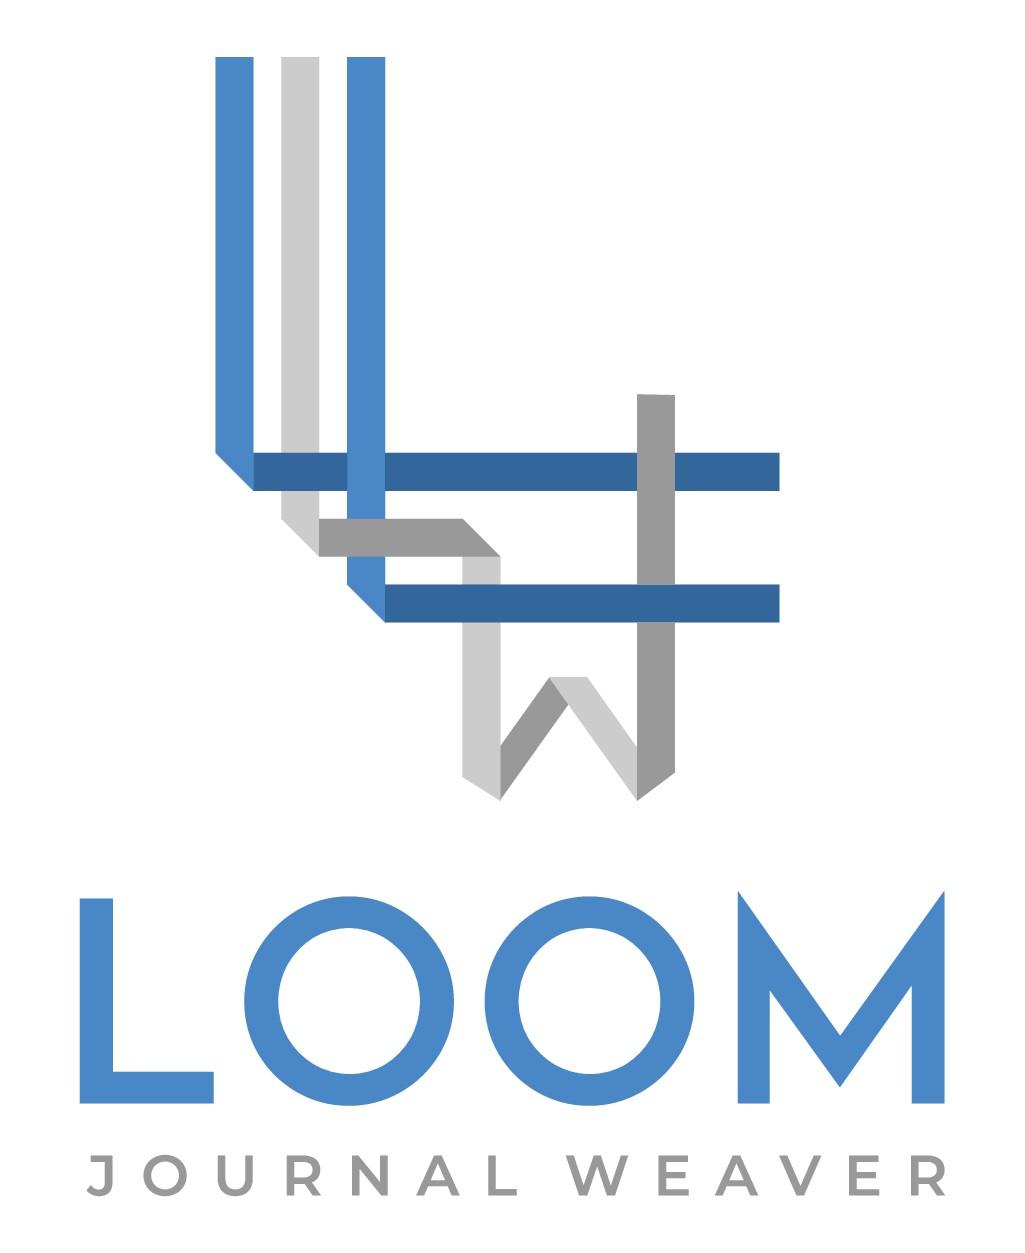 logo that captures the essence of a unique journaling app